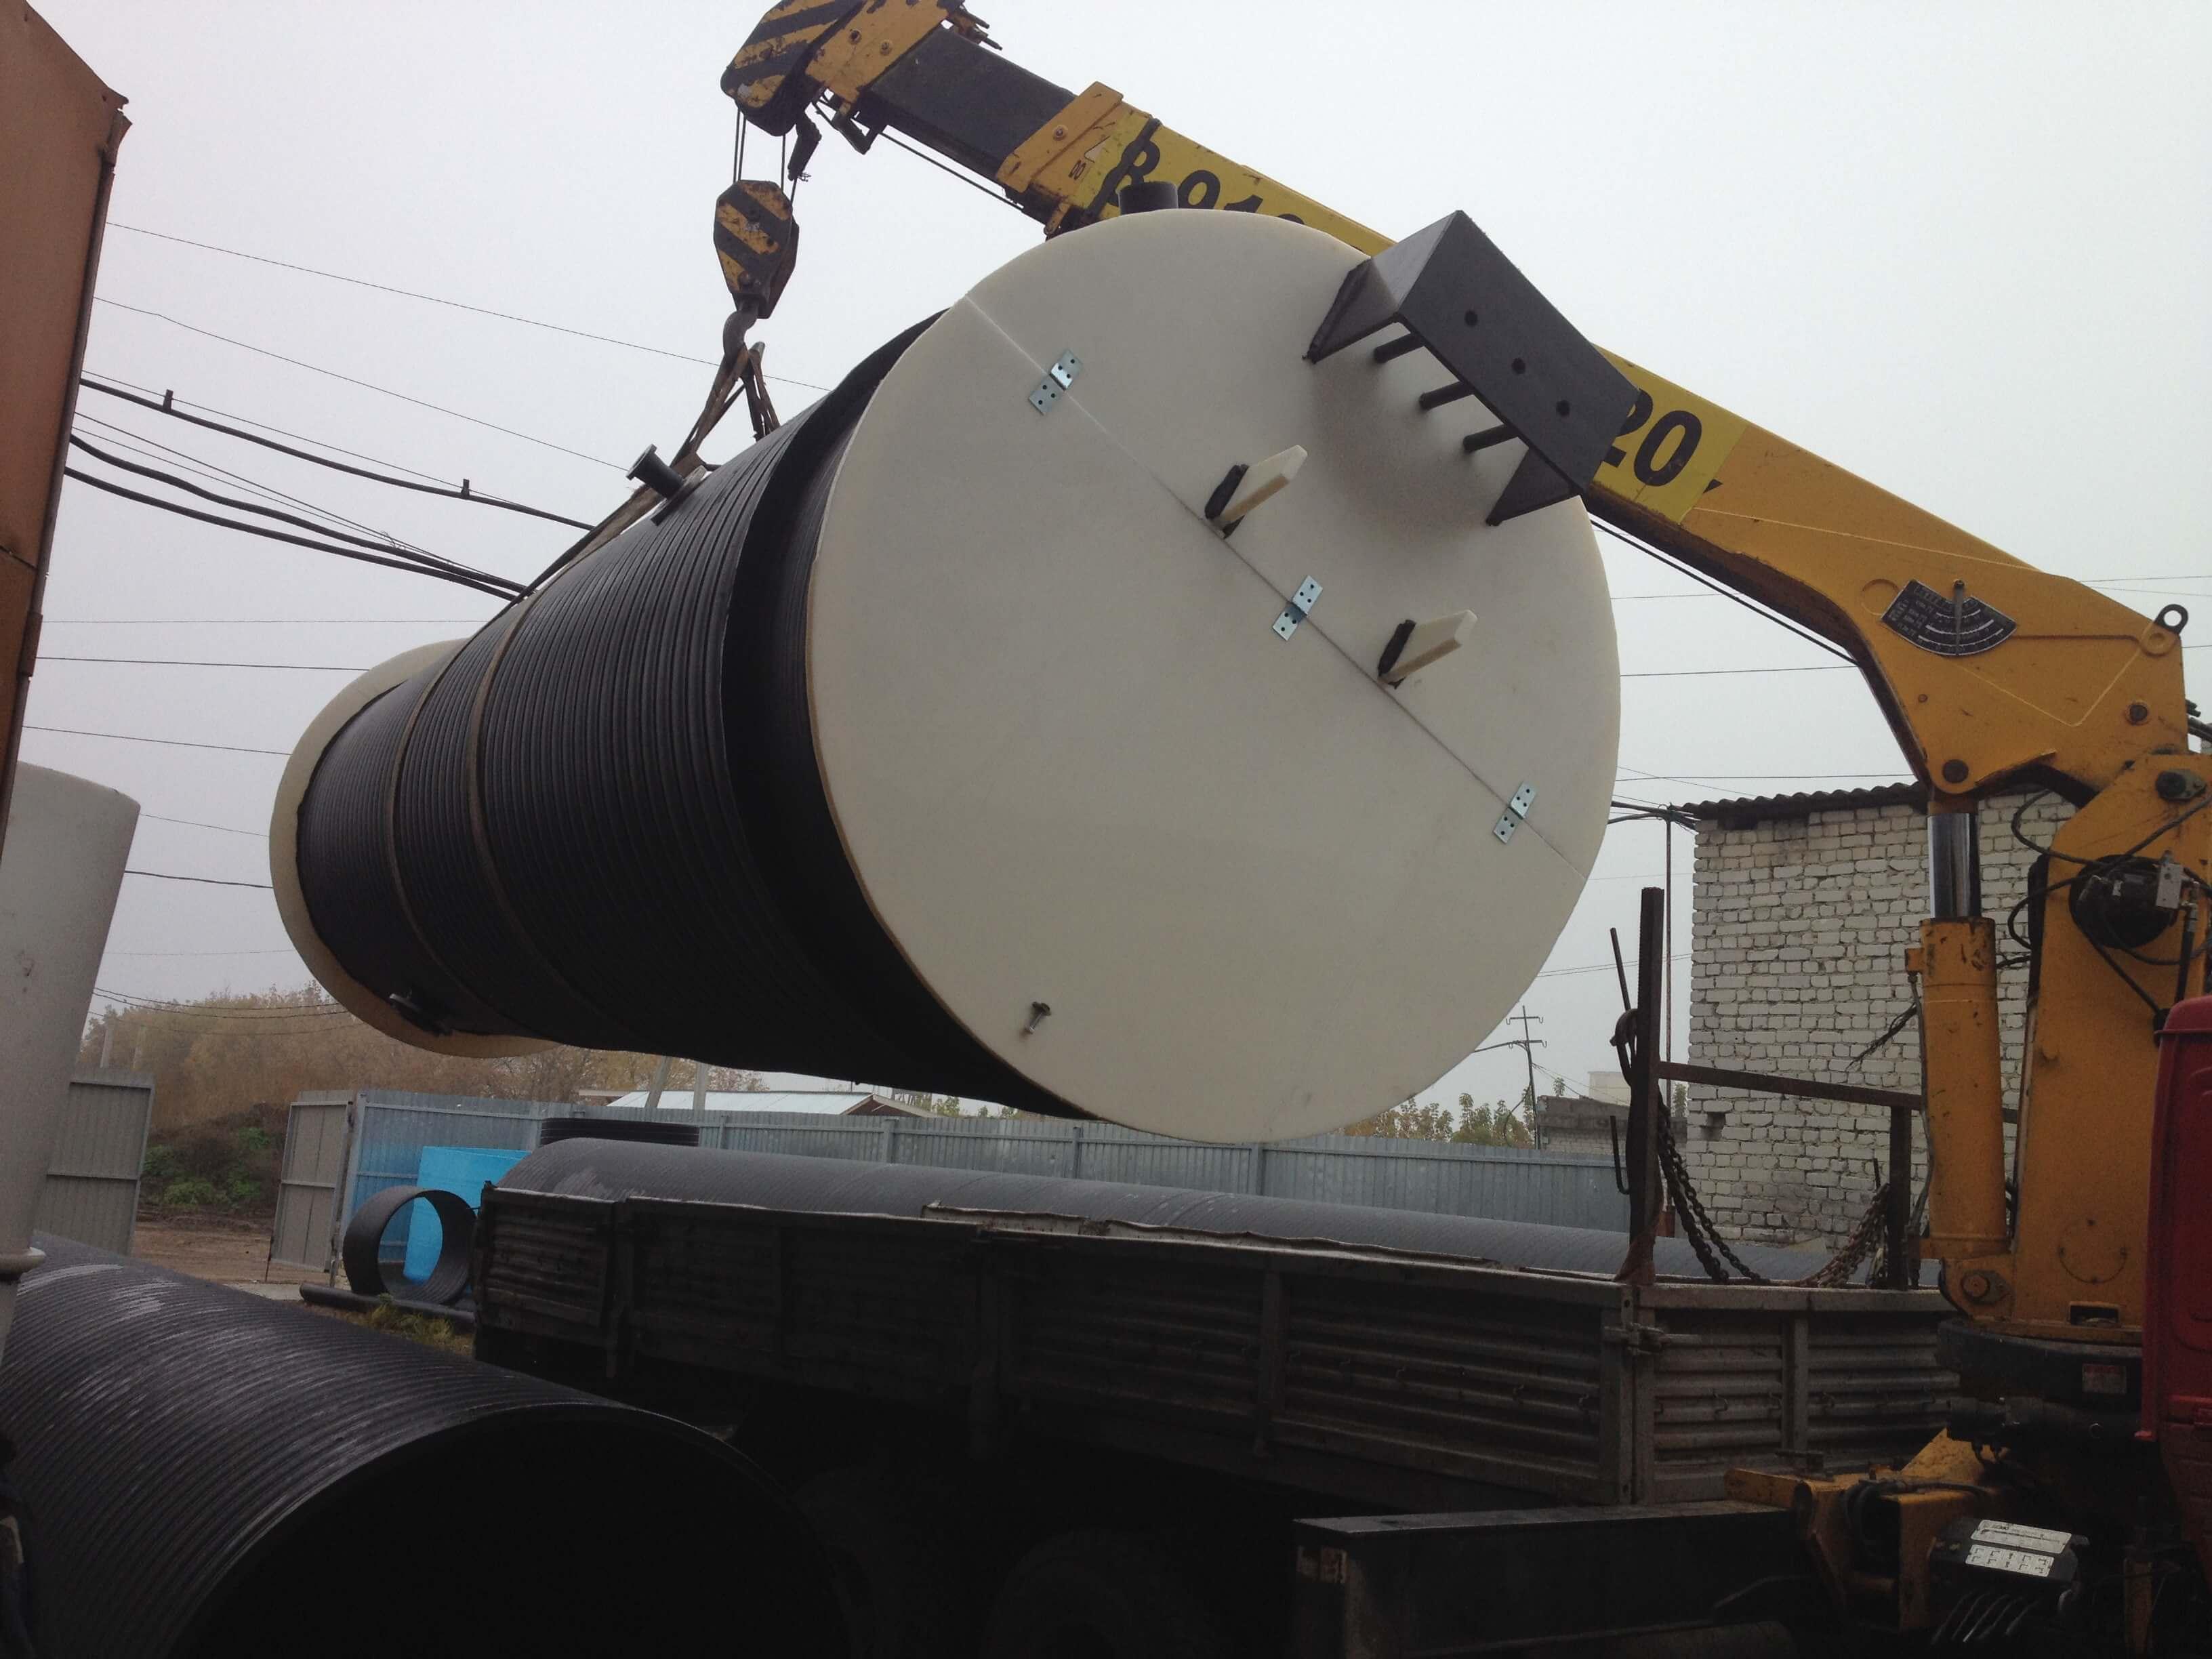 Фото №1. Комплектная канализационная насосная станция Germes-Plast KNS ПЭ 1,5/6,5. (Вид 1)